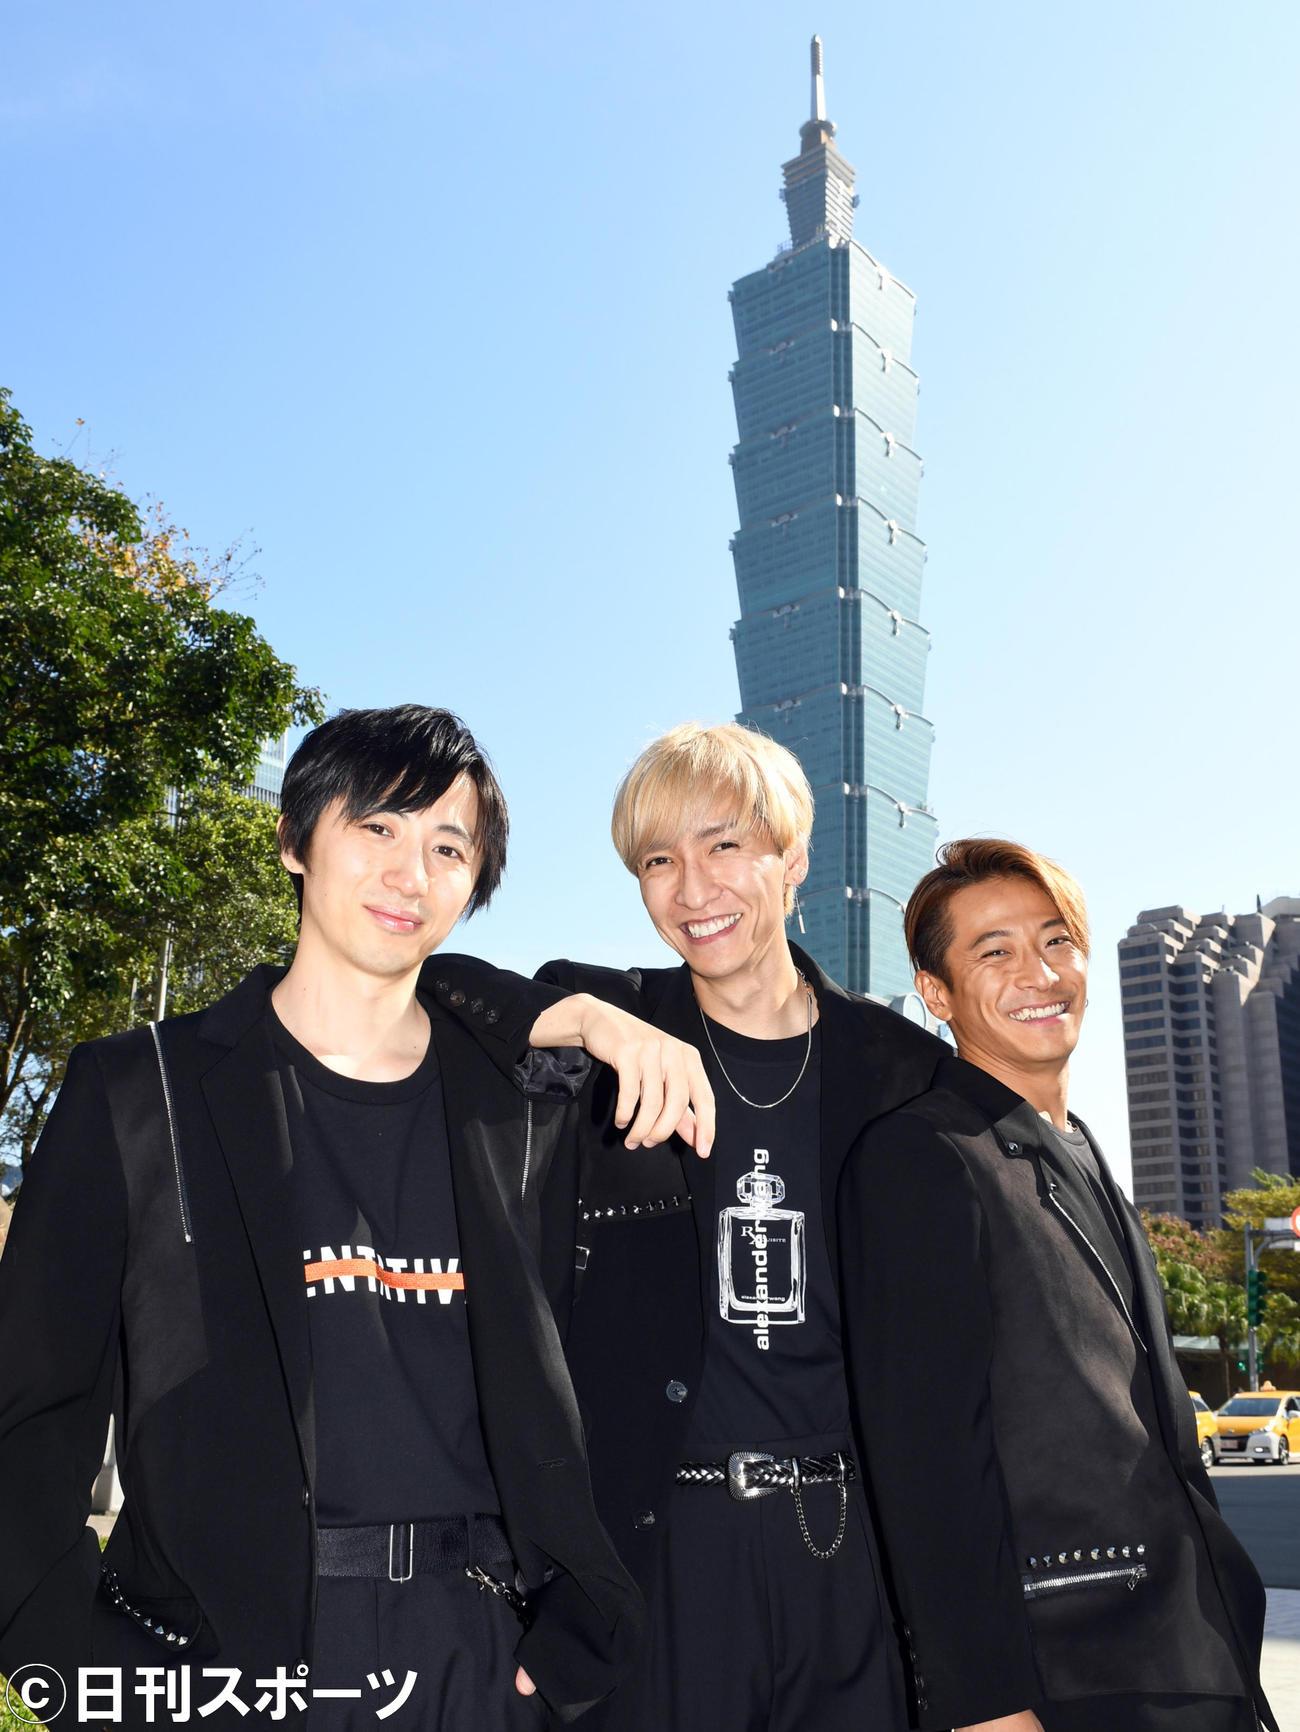 w-inds.の左から千葉涼平、橘慶太、緒方龍一(2020年1月4日撮影)